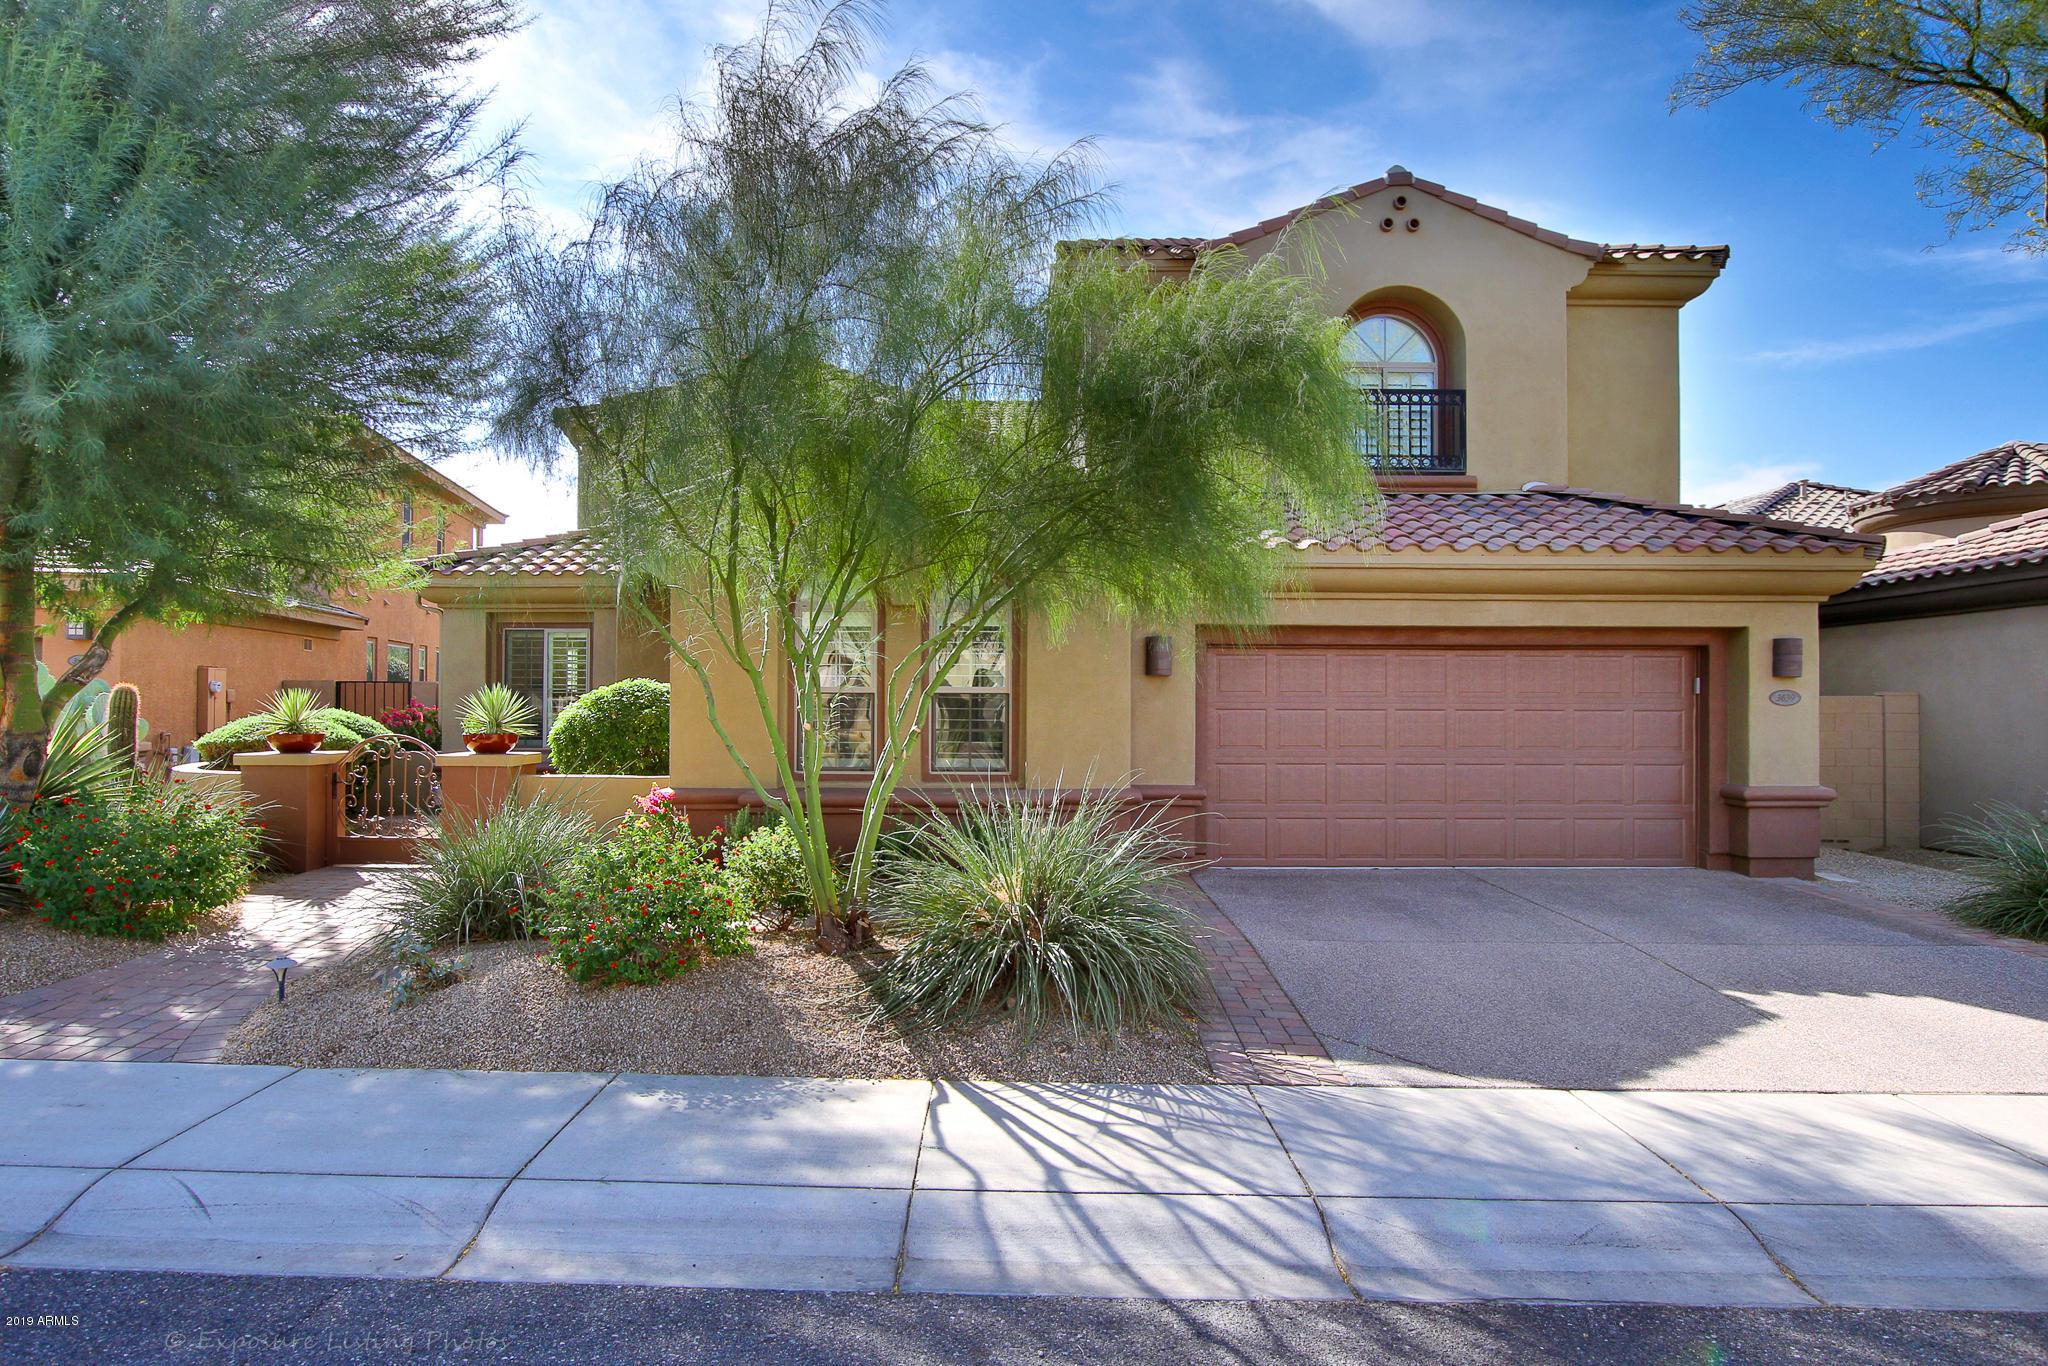 Photo of 3639 E Louise Drive, Phoenix, AZ 85050